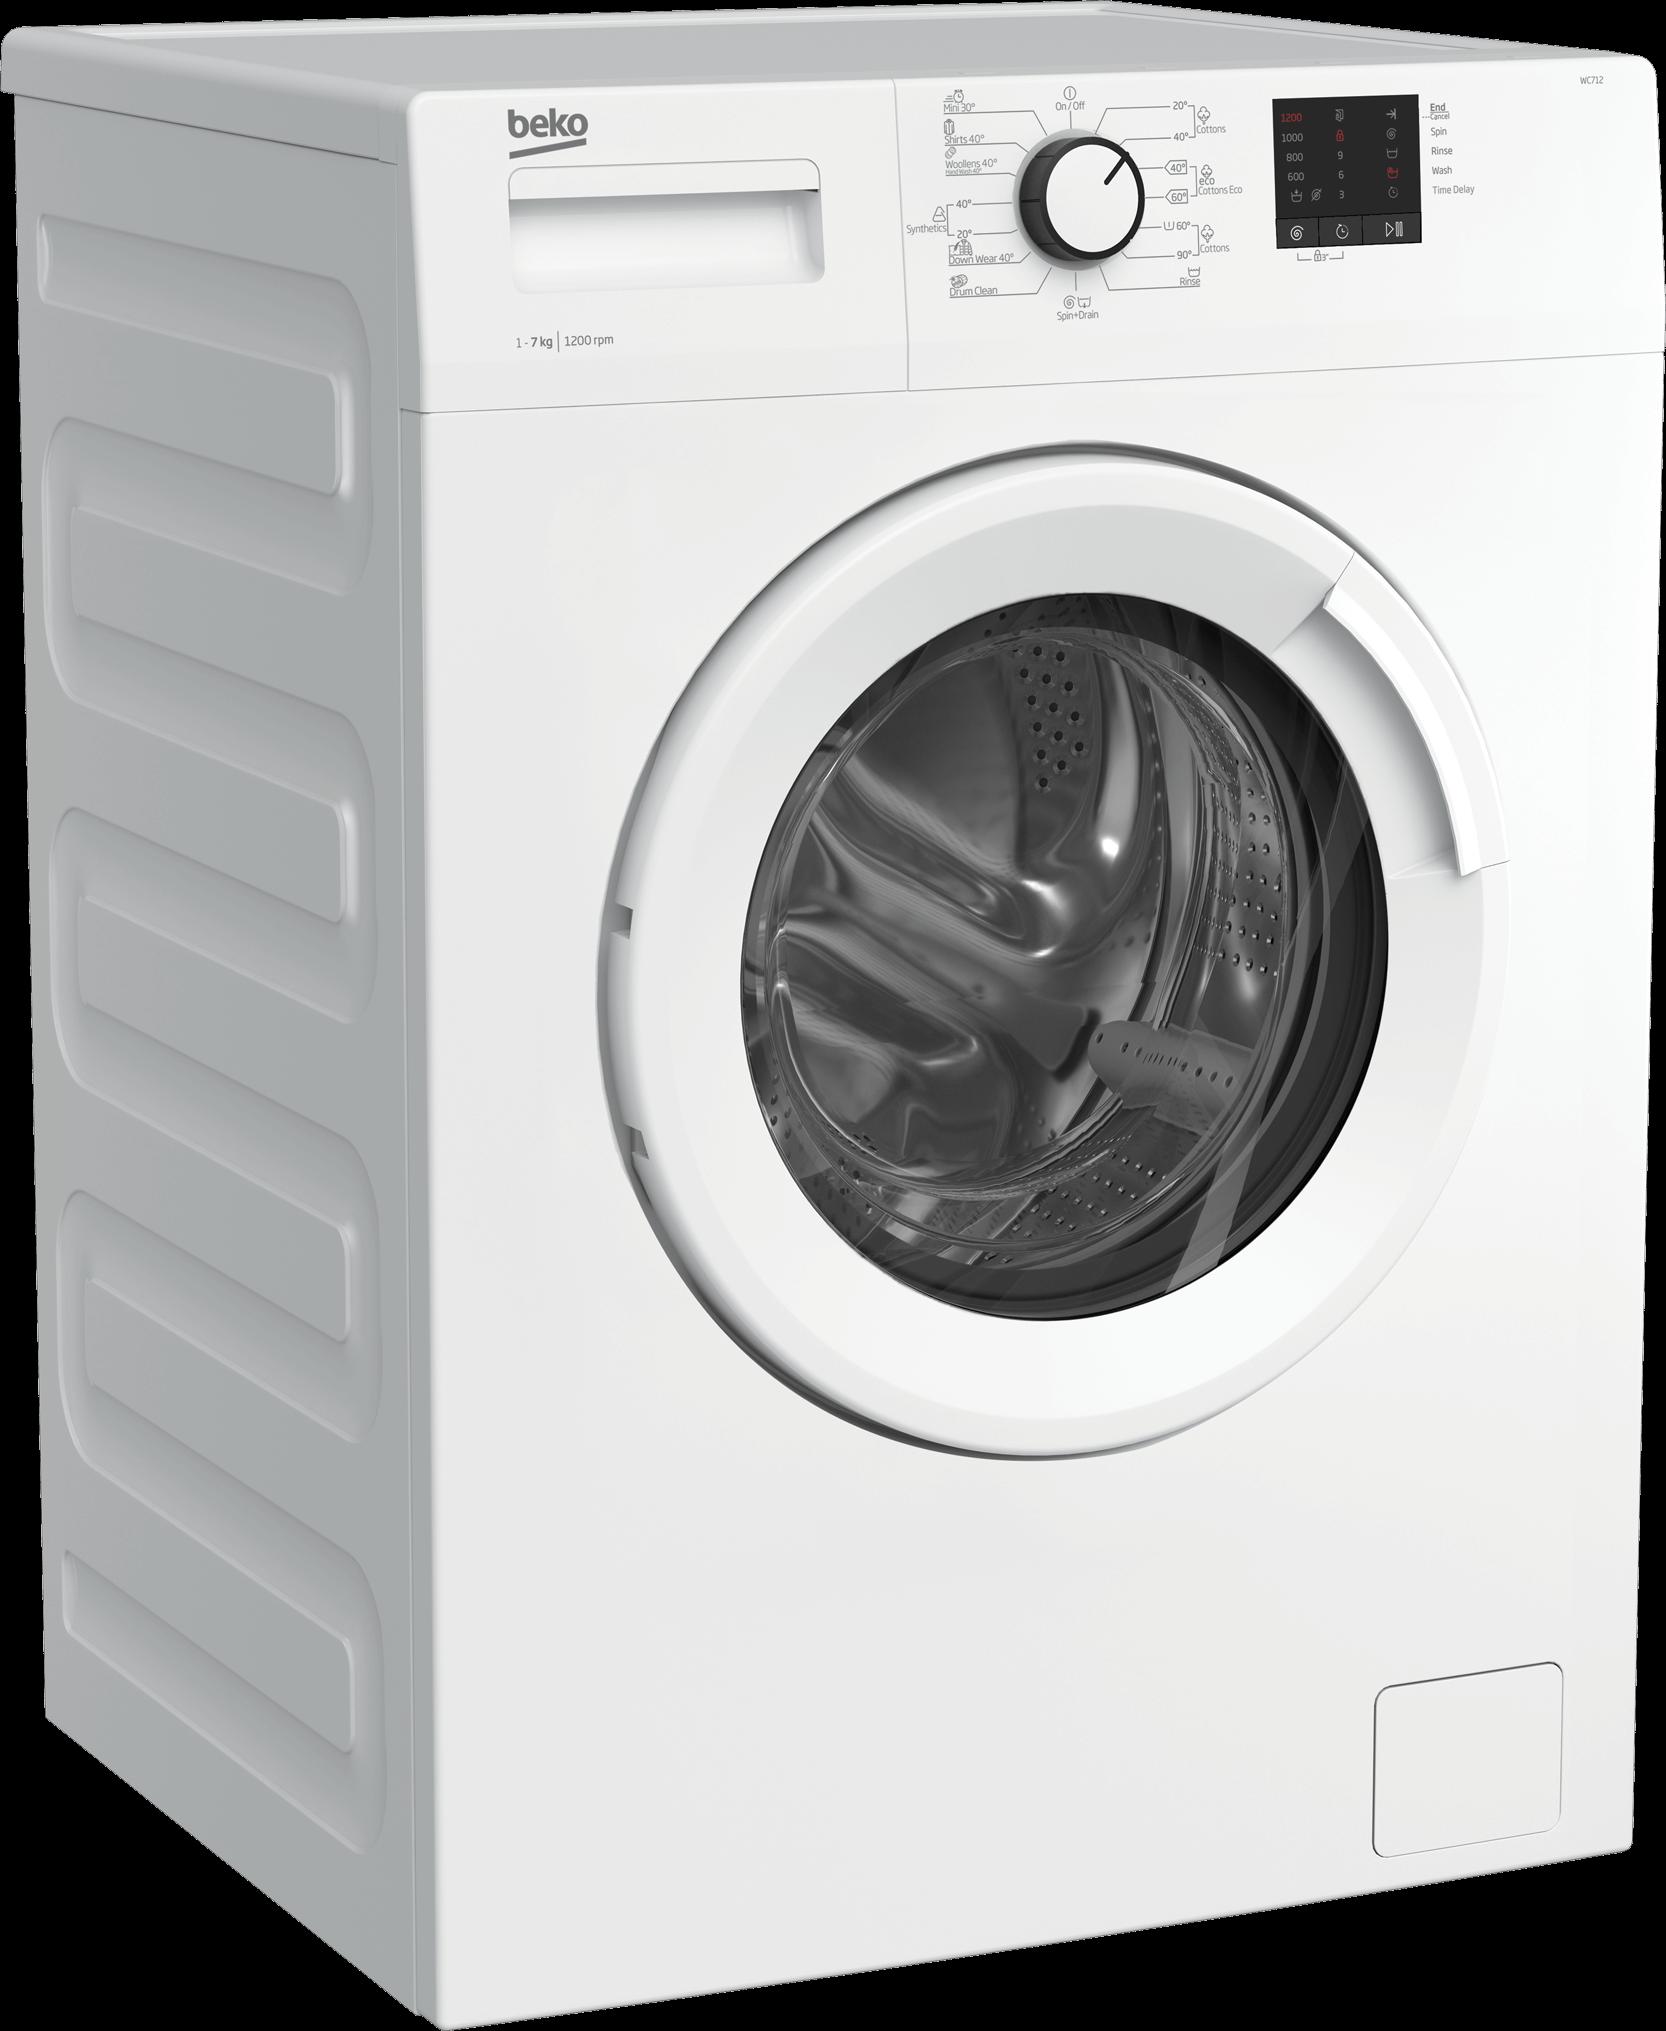 BEKO 7Kg Front Load Washing Machine WC712